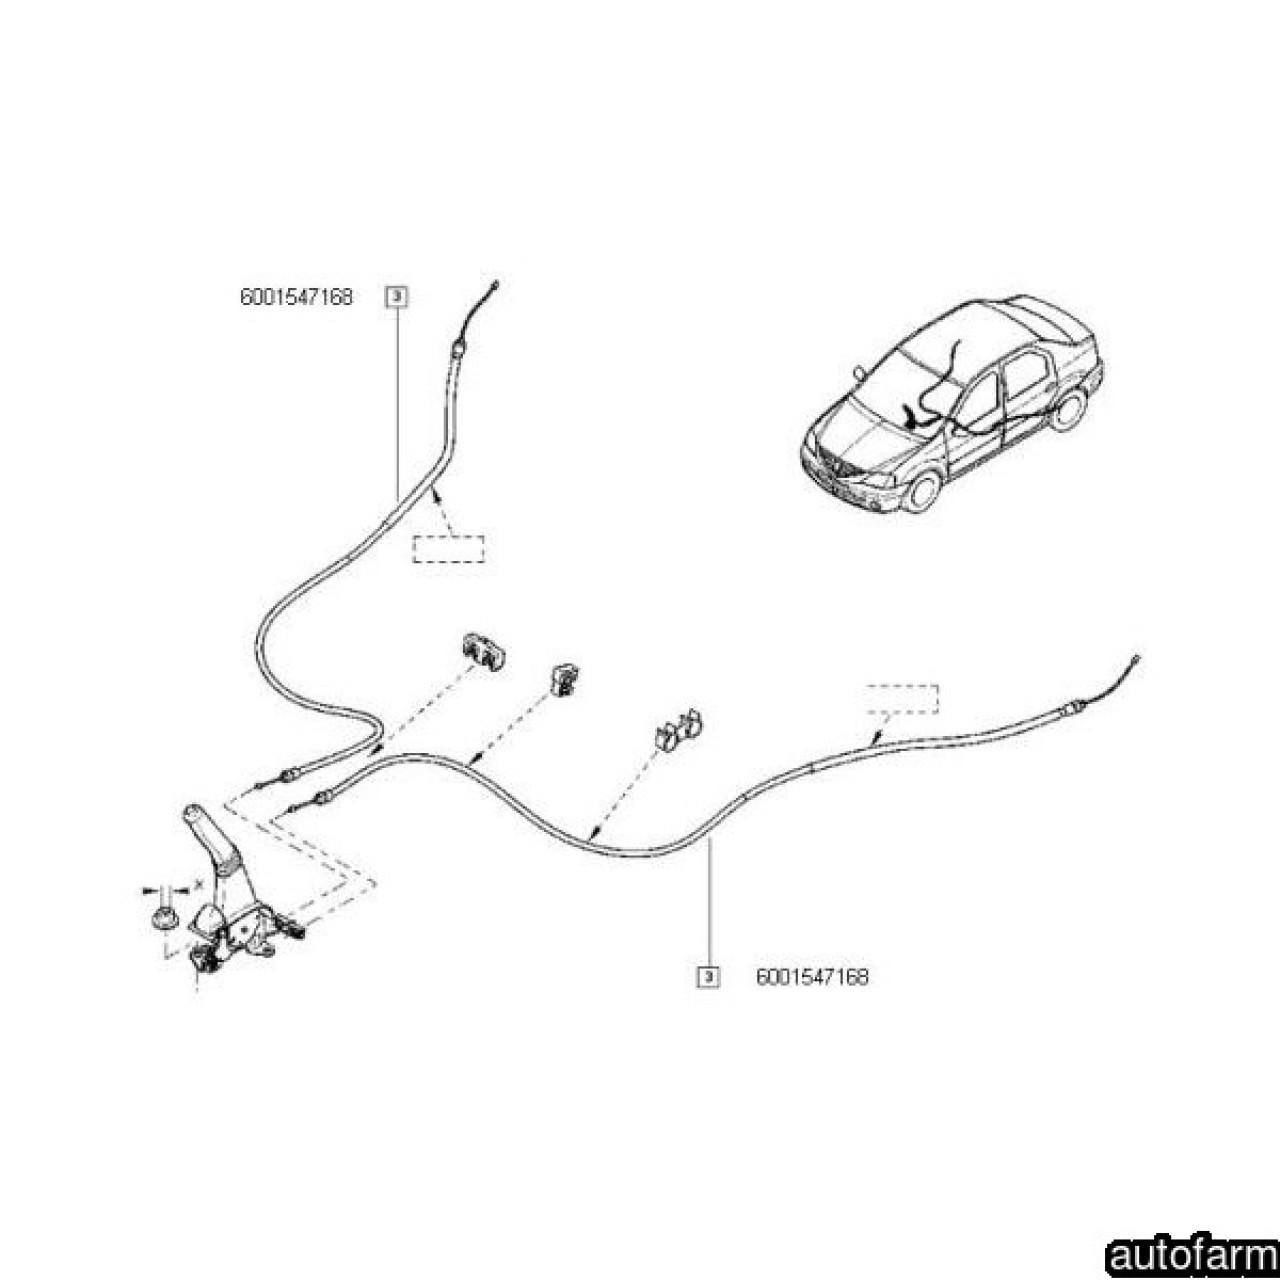 Cablu Frana Mana Logan Sandero Mm Ngh Autotechnik Ngh